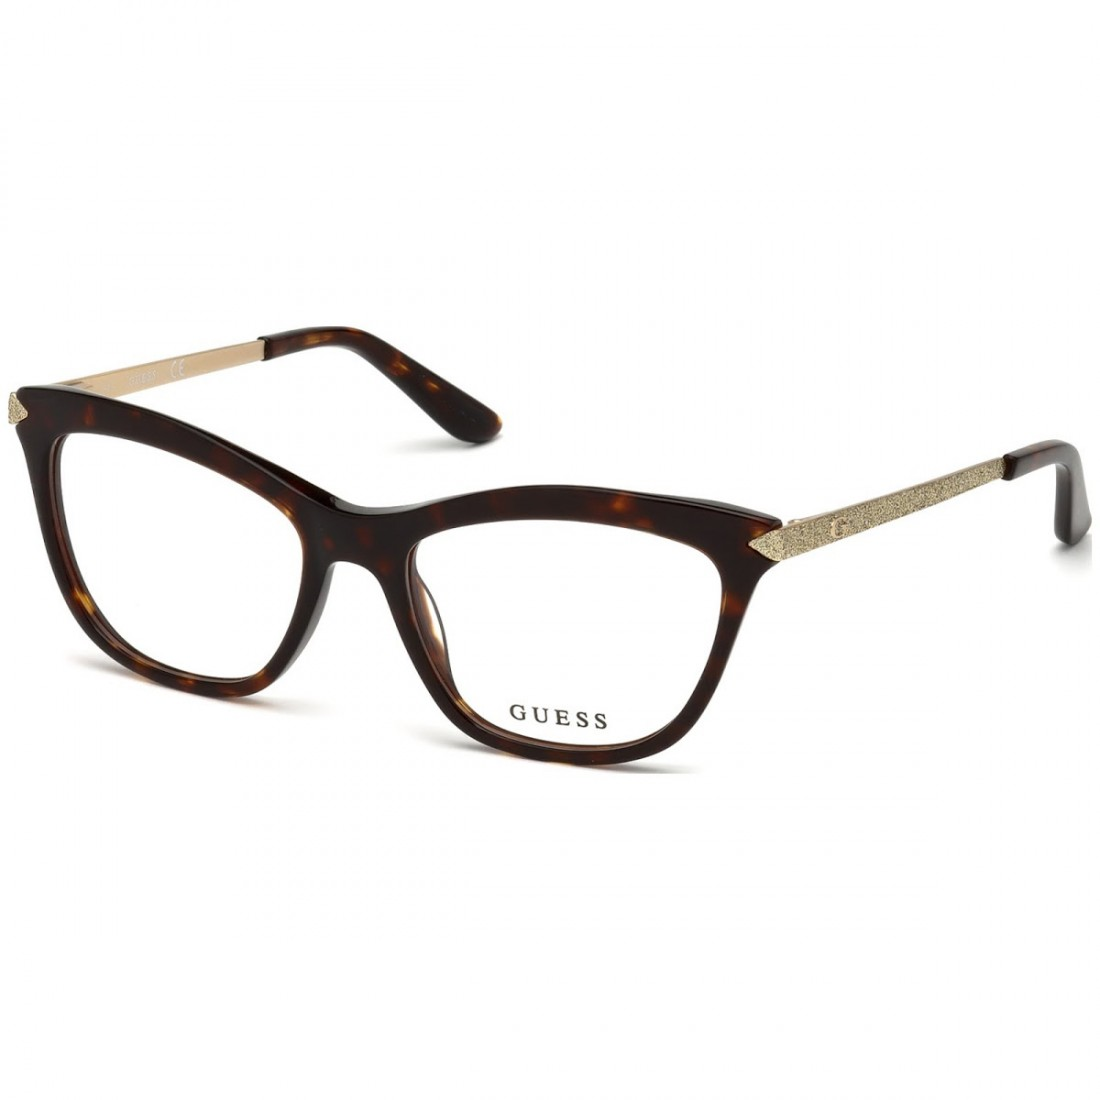 Rame ochelari de vedere, de dama, Guess GU2655 052 53 - Havana Guess Rame de vedere Dama